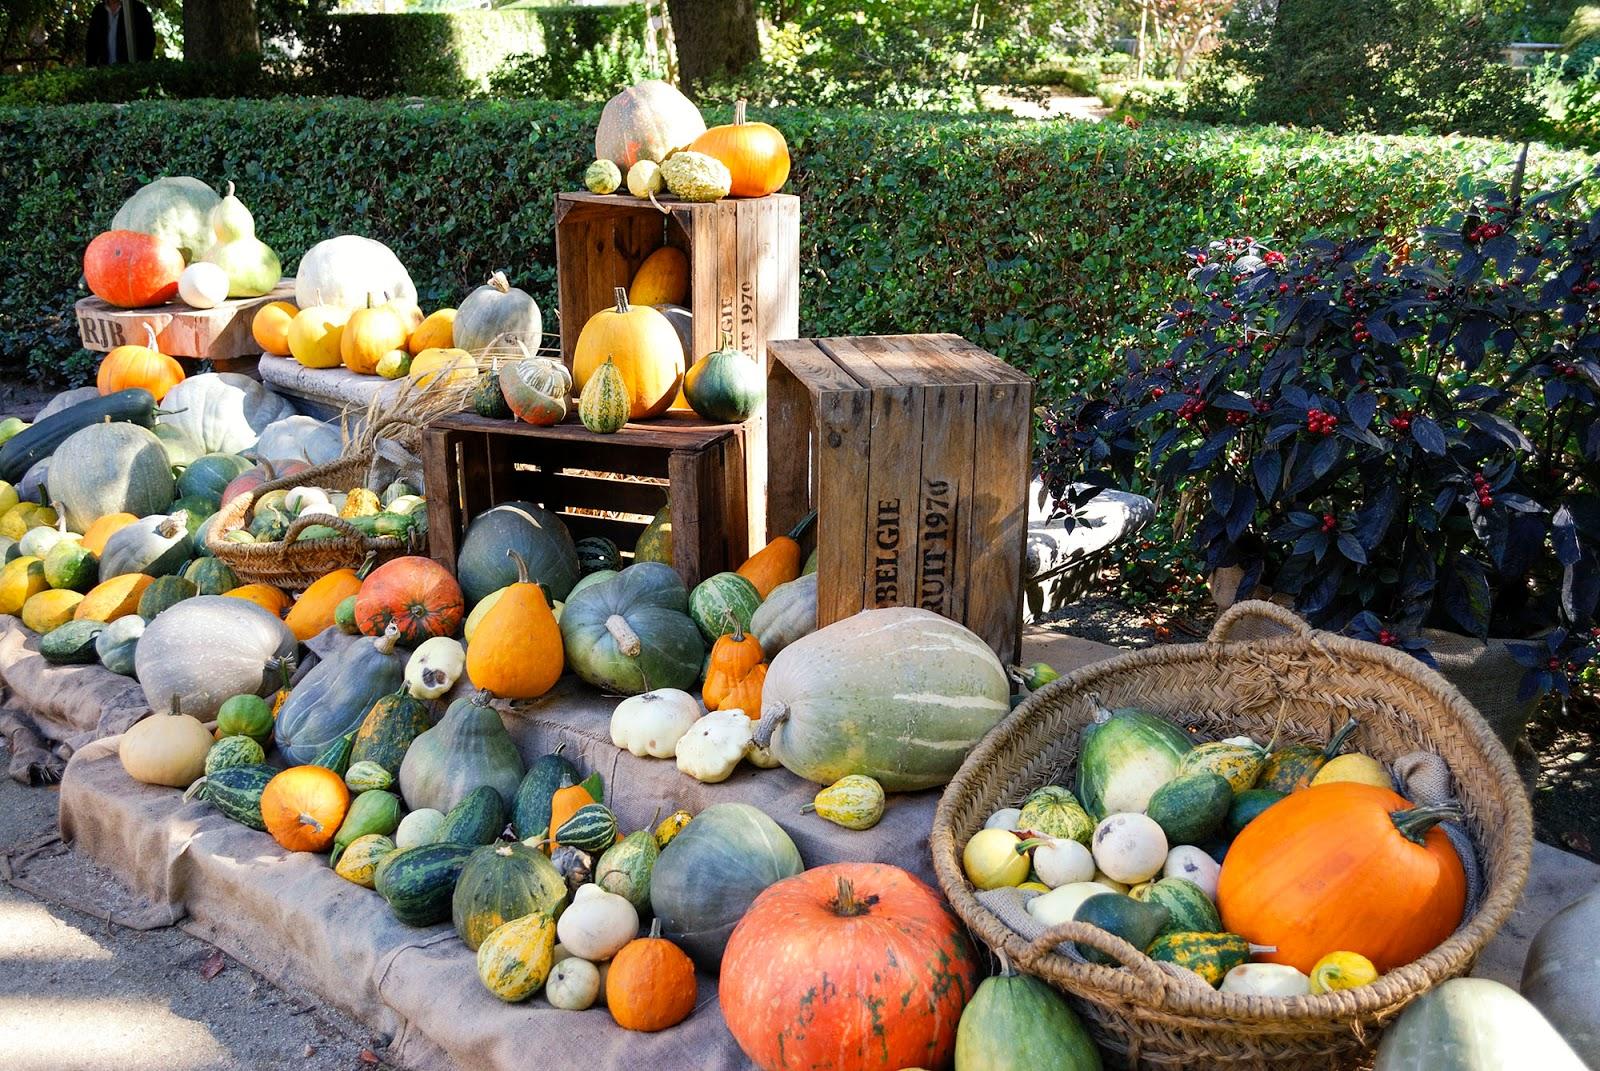 Royal Botanic Gardens fall autumn pumpkin display exhibit Madrid